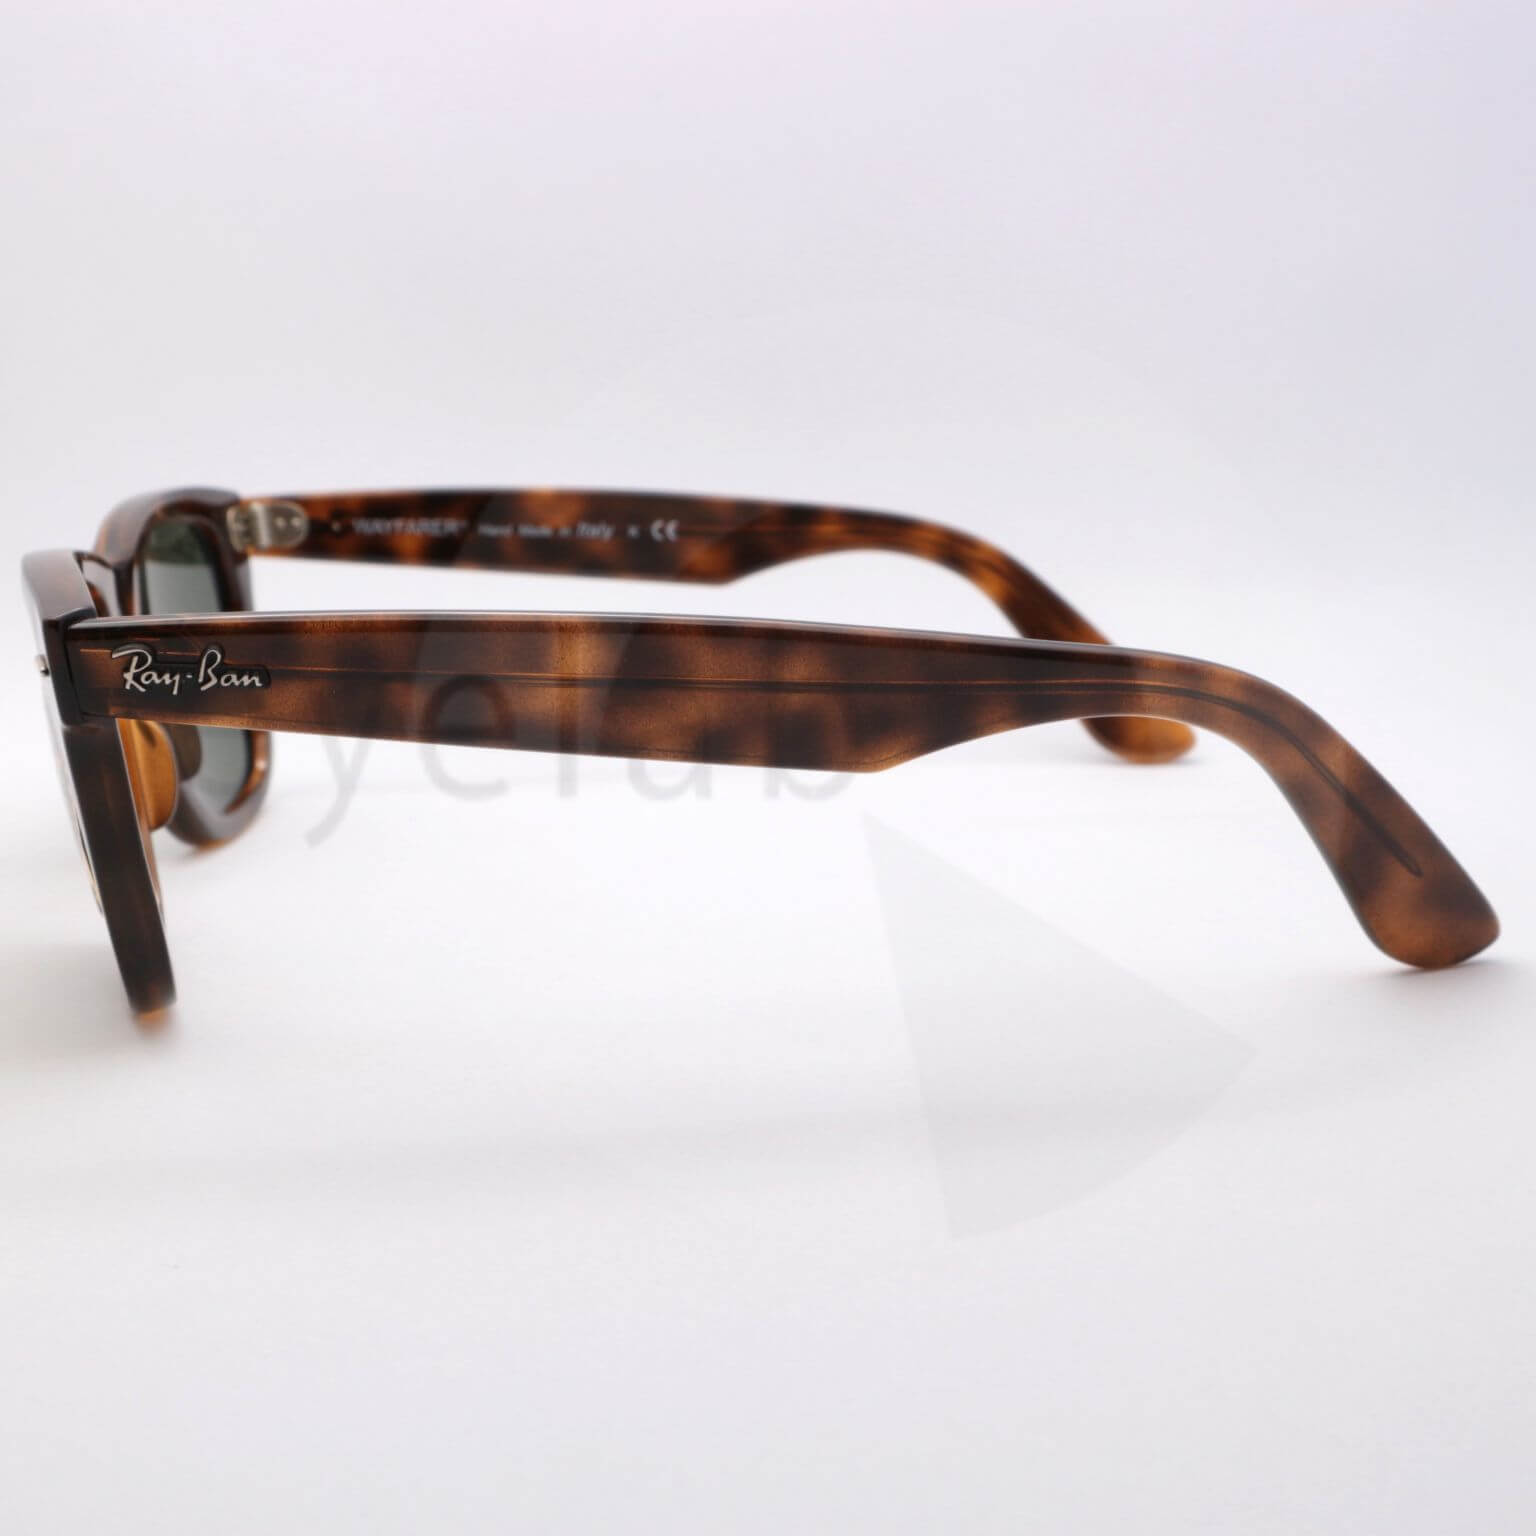 1685a80773 Γυαλιά ηλίου Ray-Ban Wayfarer Ease 4340 710 50 ~ Eyelab